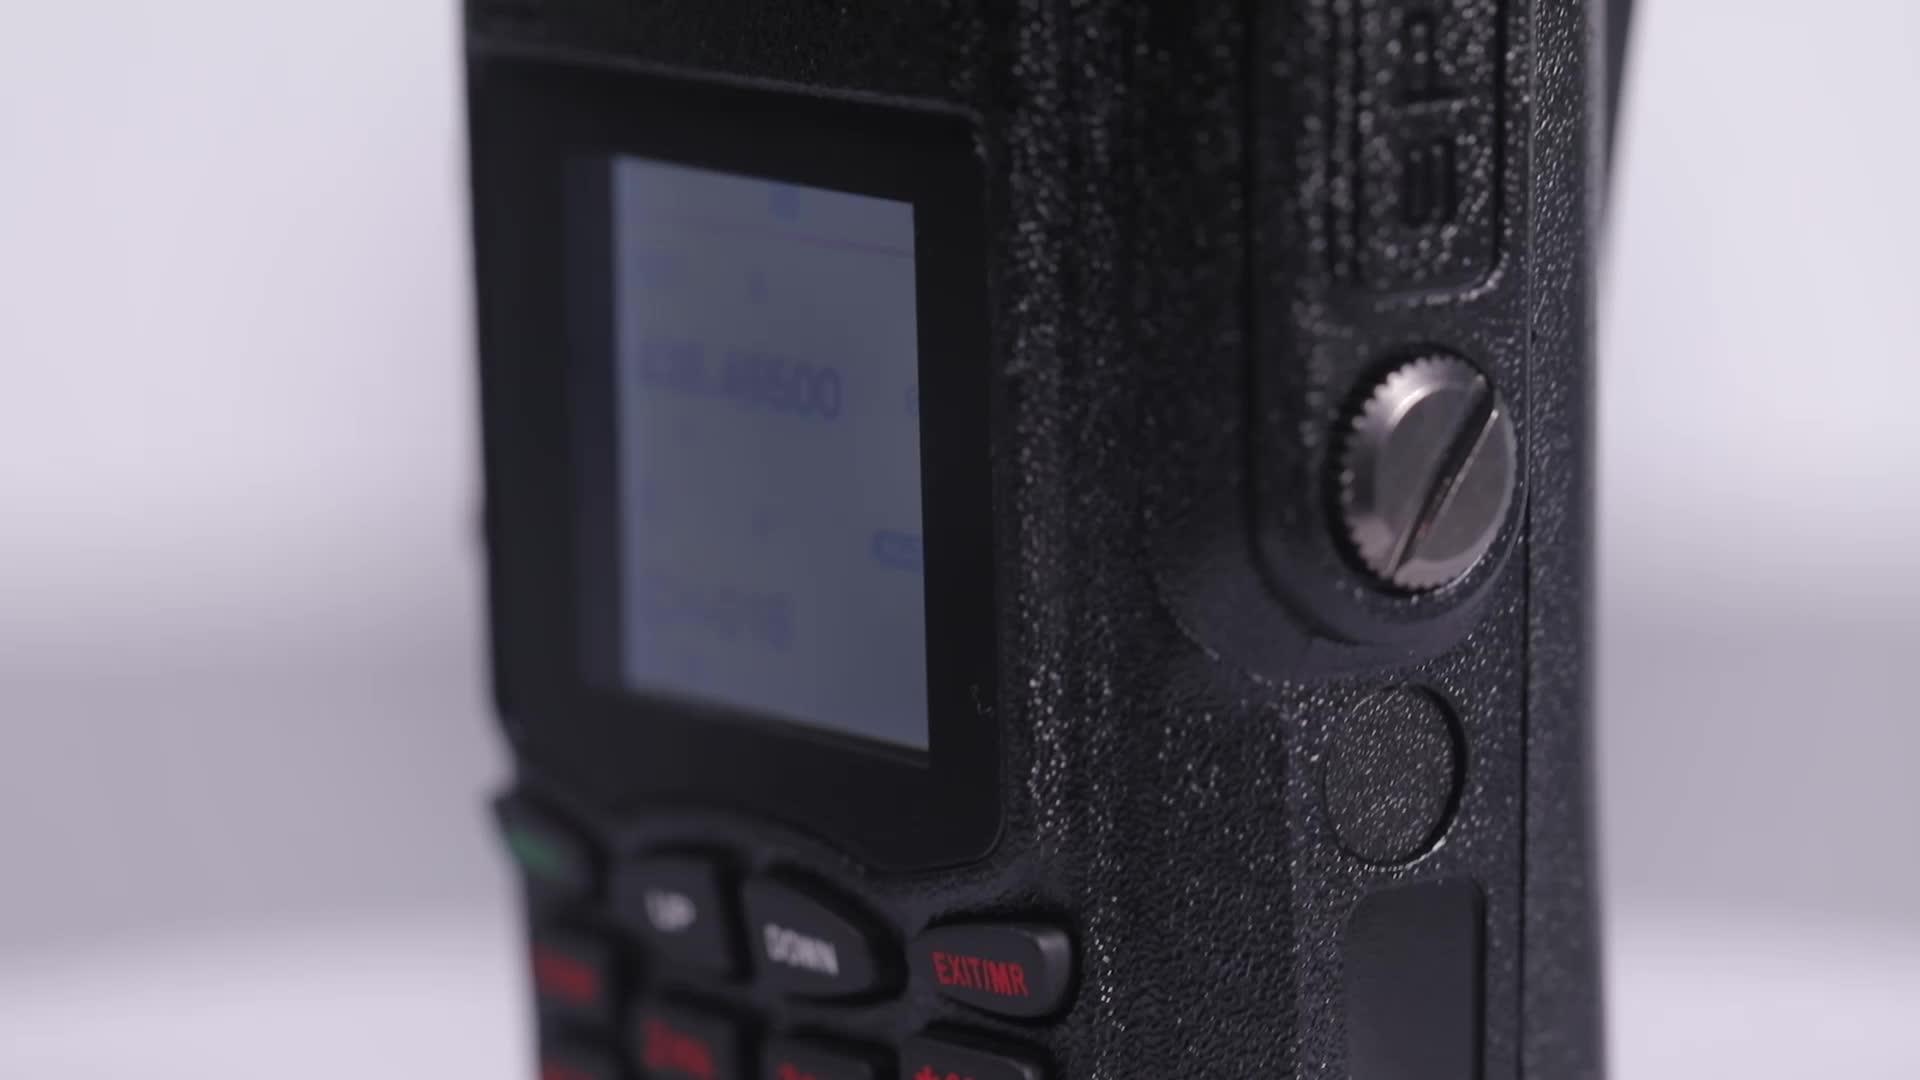 ZST-A19 10w two way walkie talkie long range 999ch handy radio uhf vhf